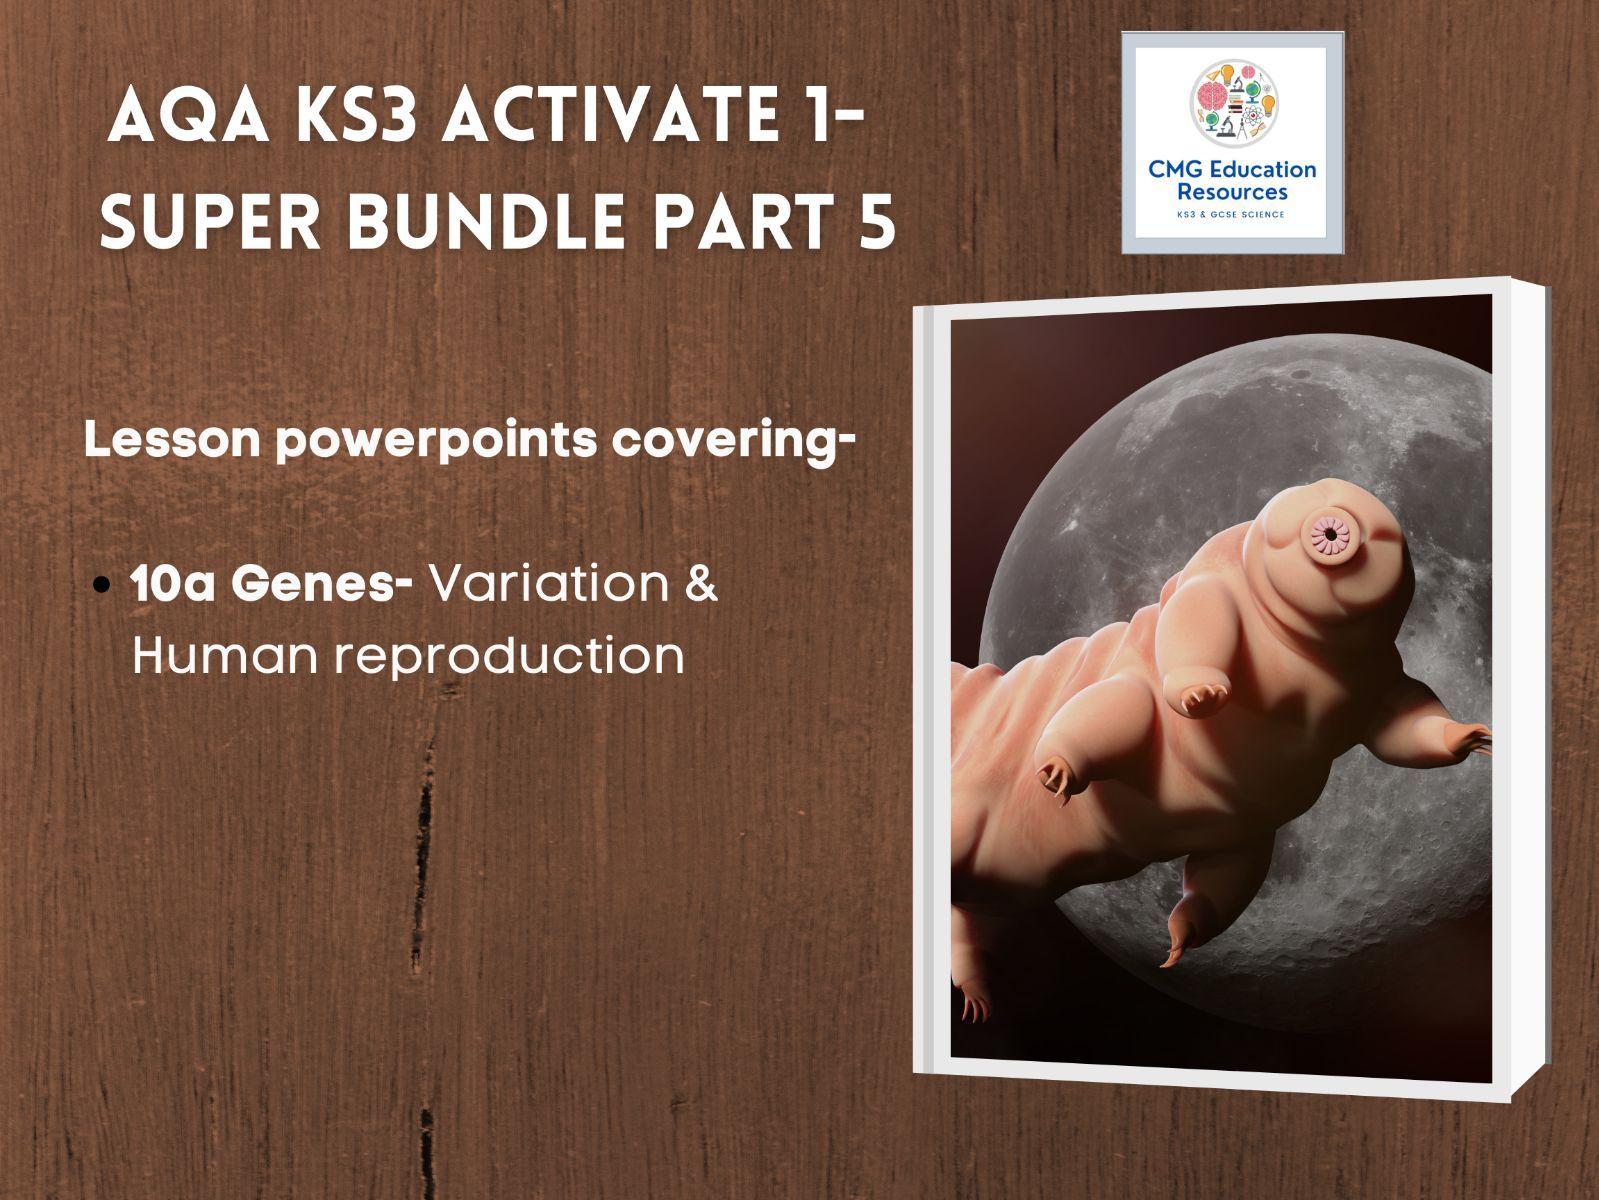 KS3 AQA Activate 1- Super bundle part 5